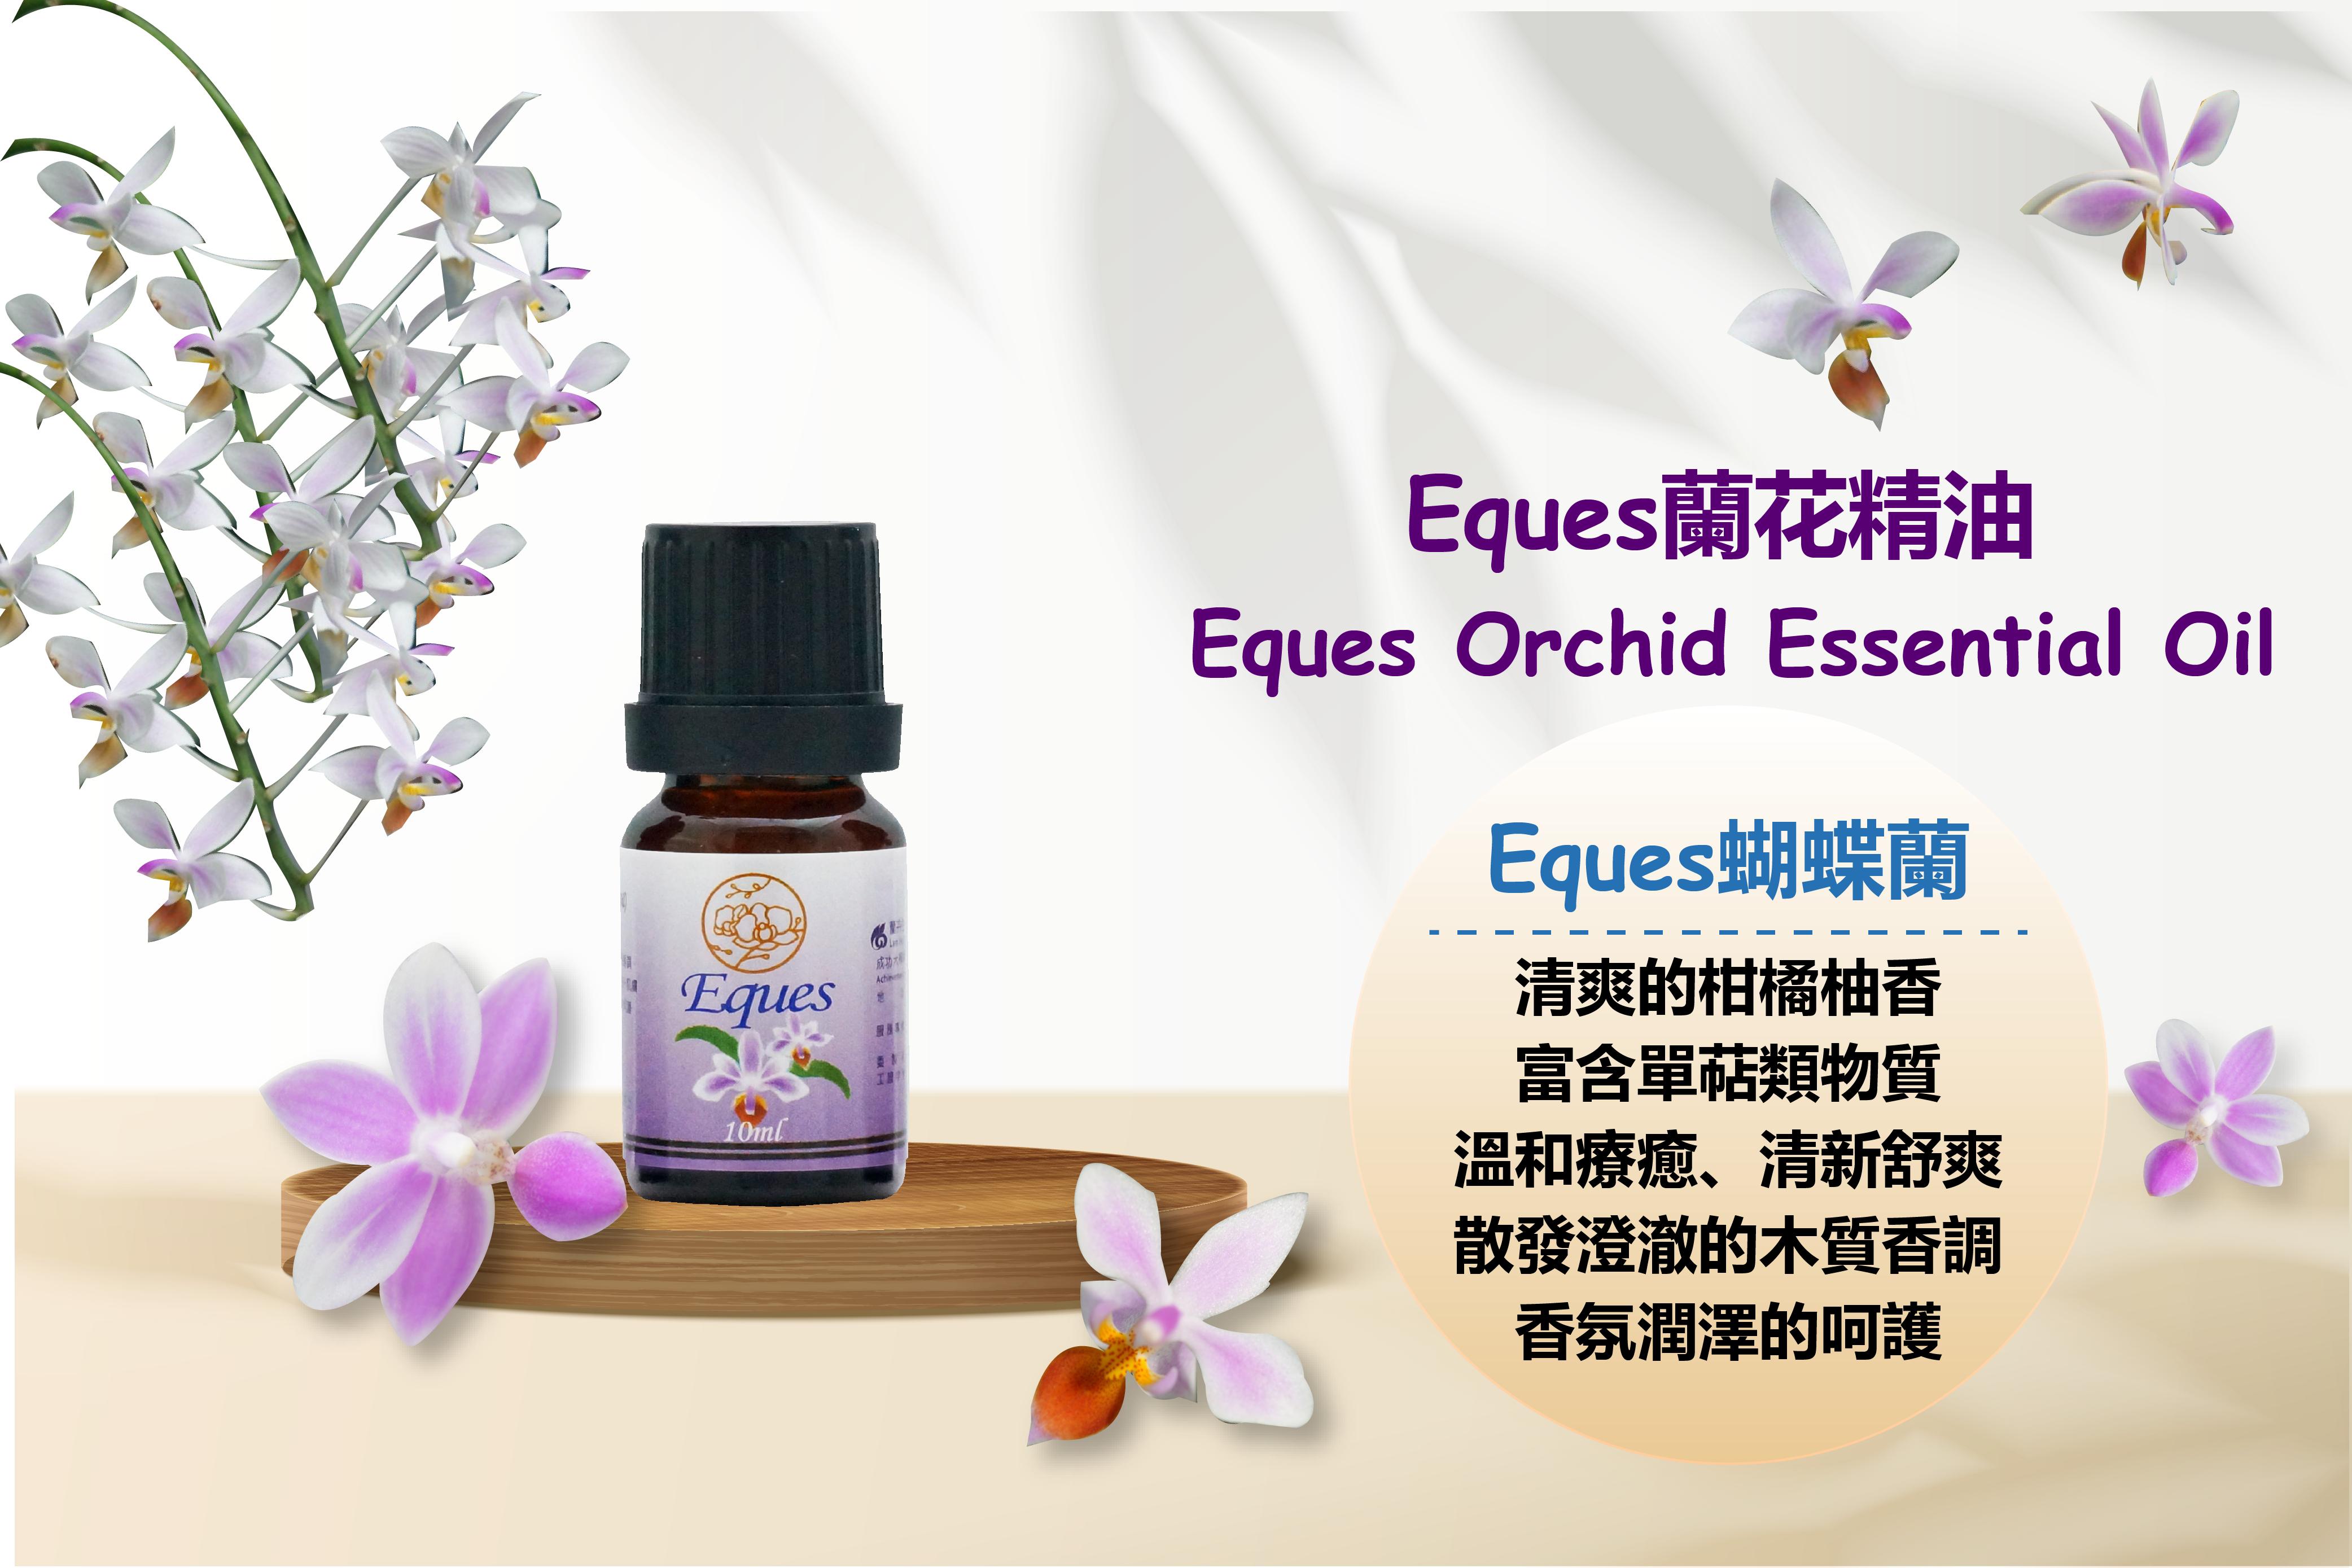 Eques精油銷售頁-01